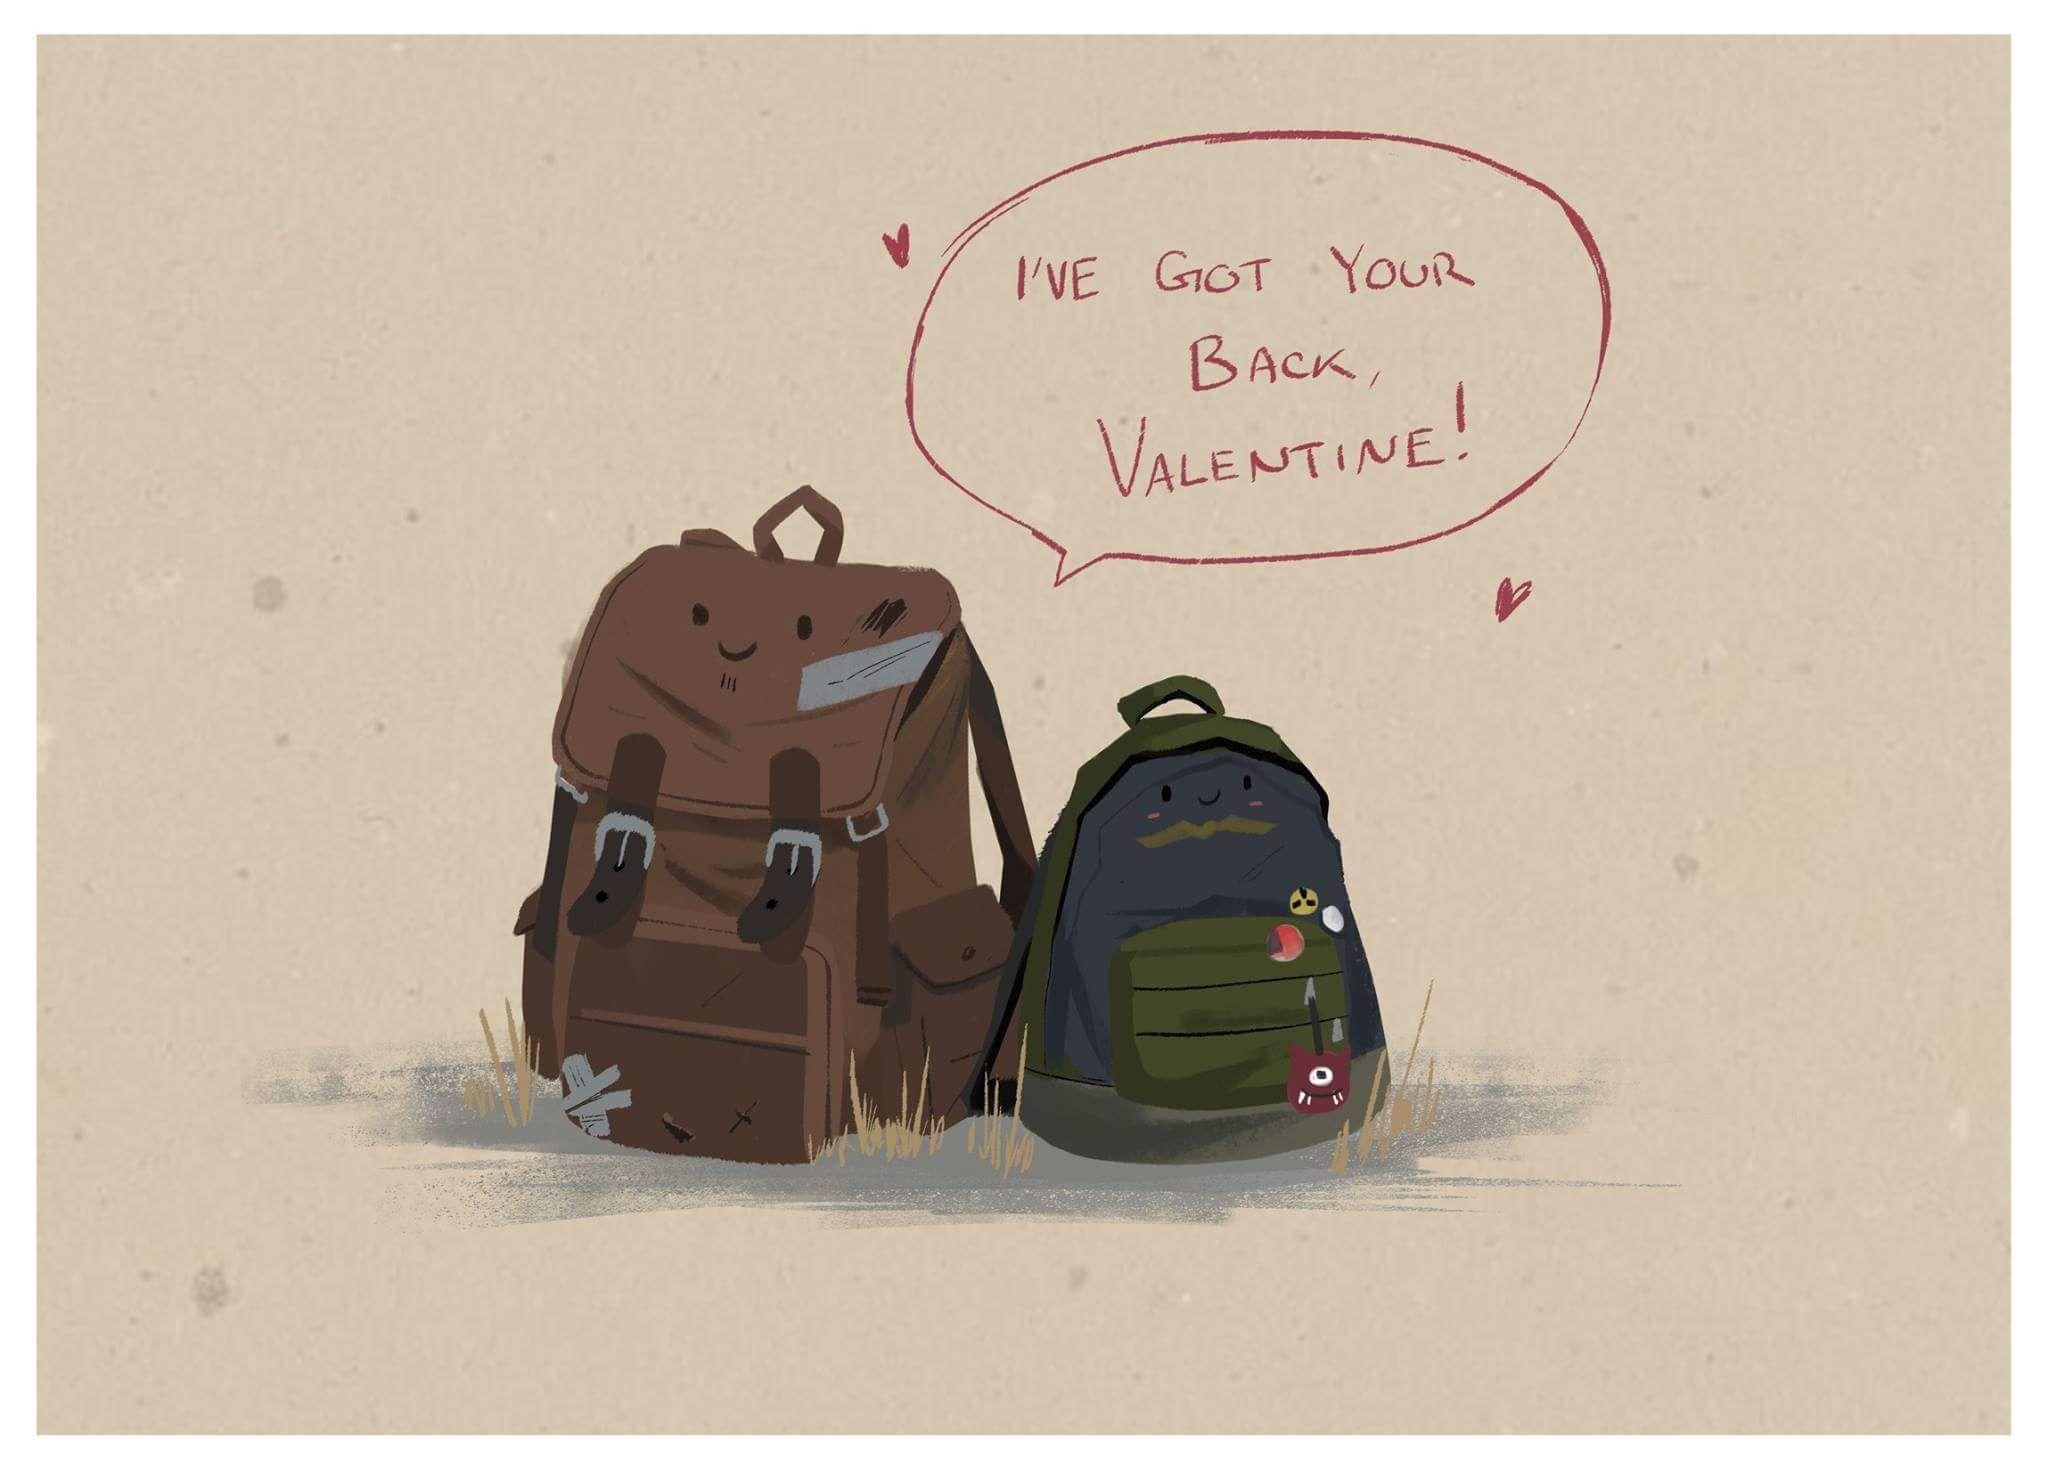 Naughty Dog's Valentine's Day Cards. http//ift.tt/2ldeOy4